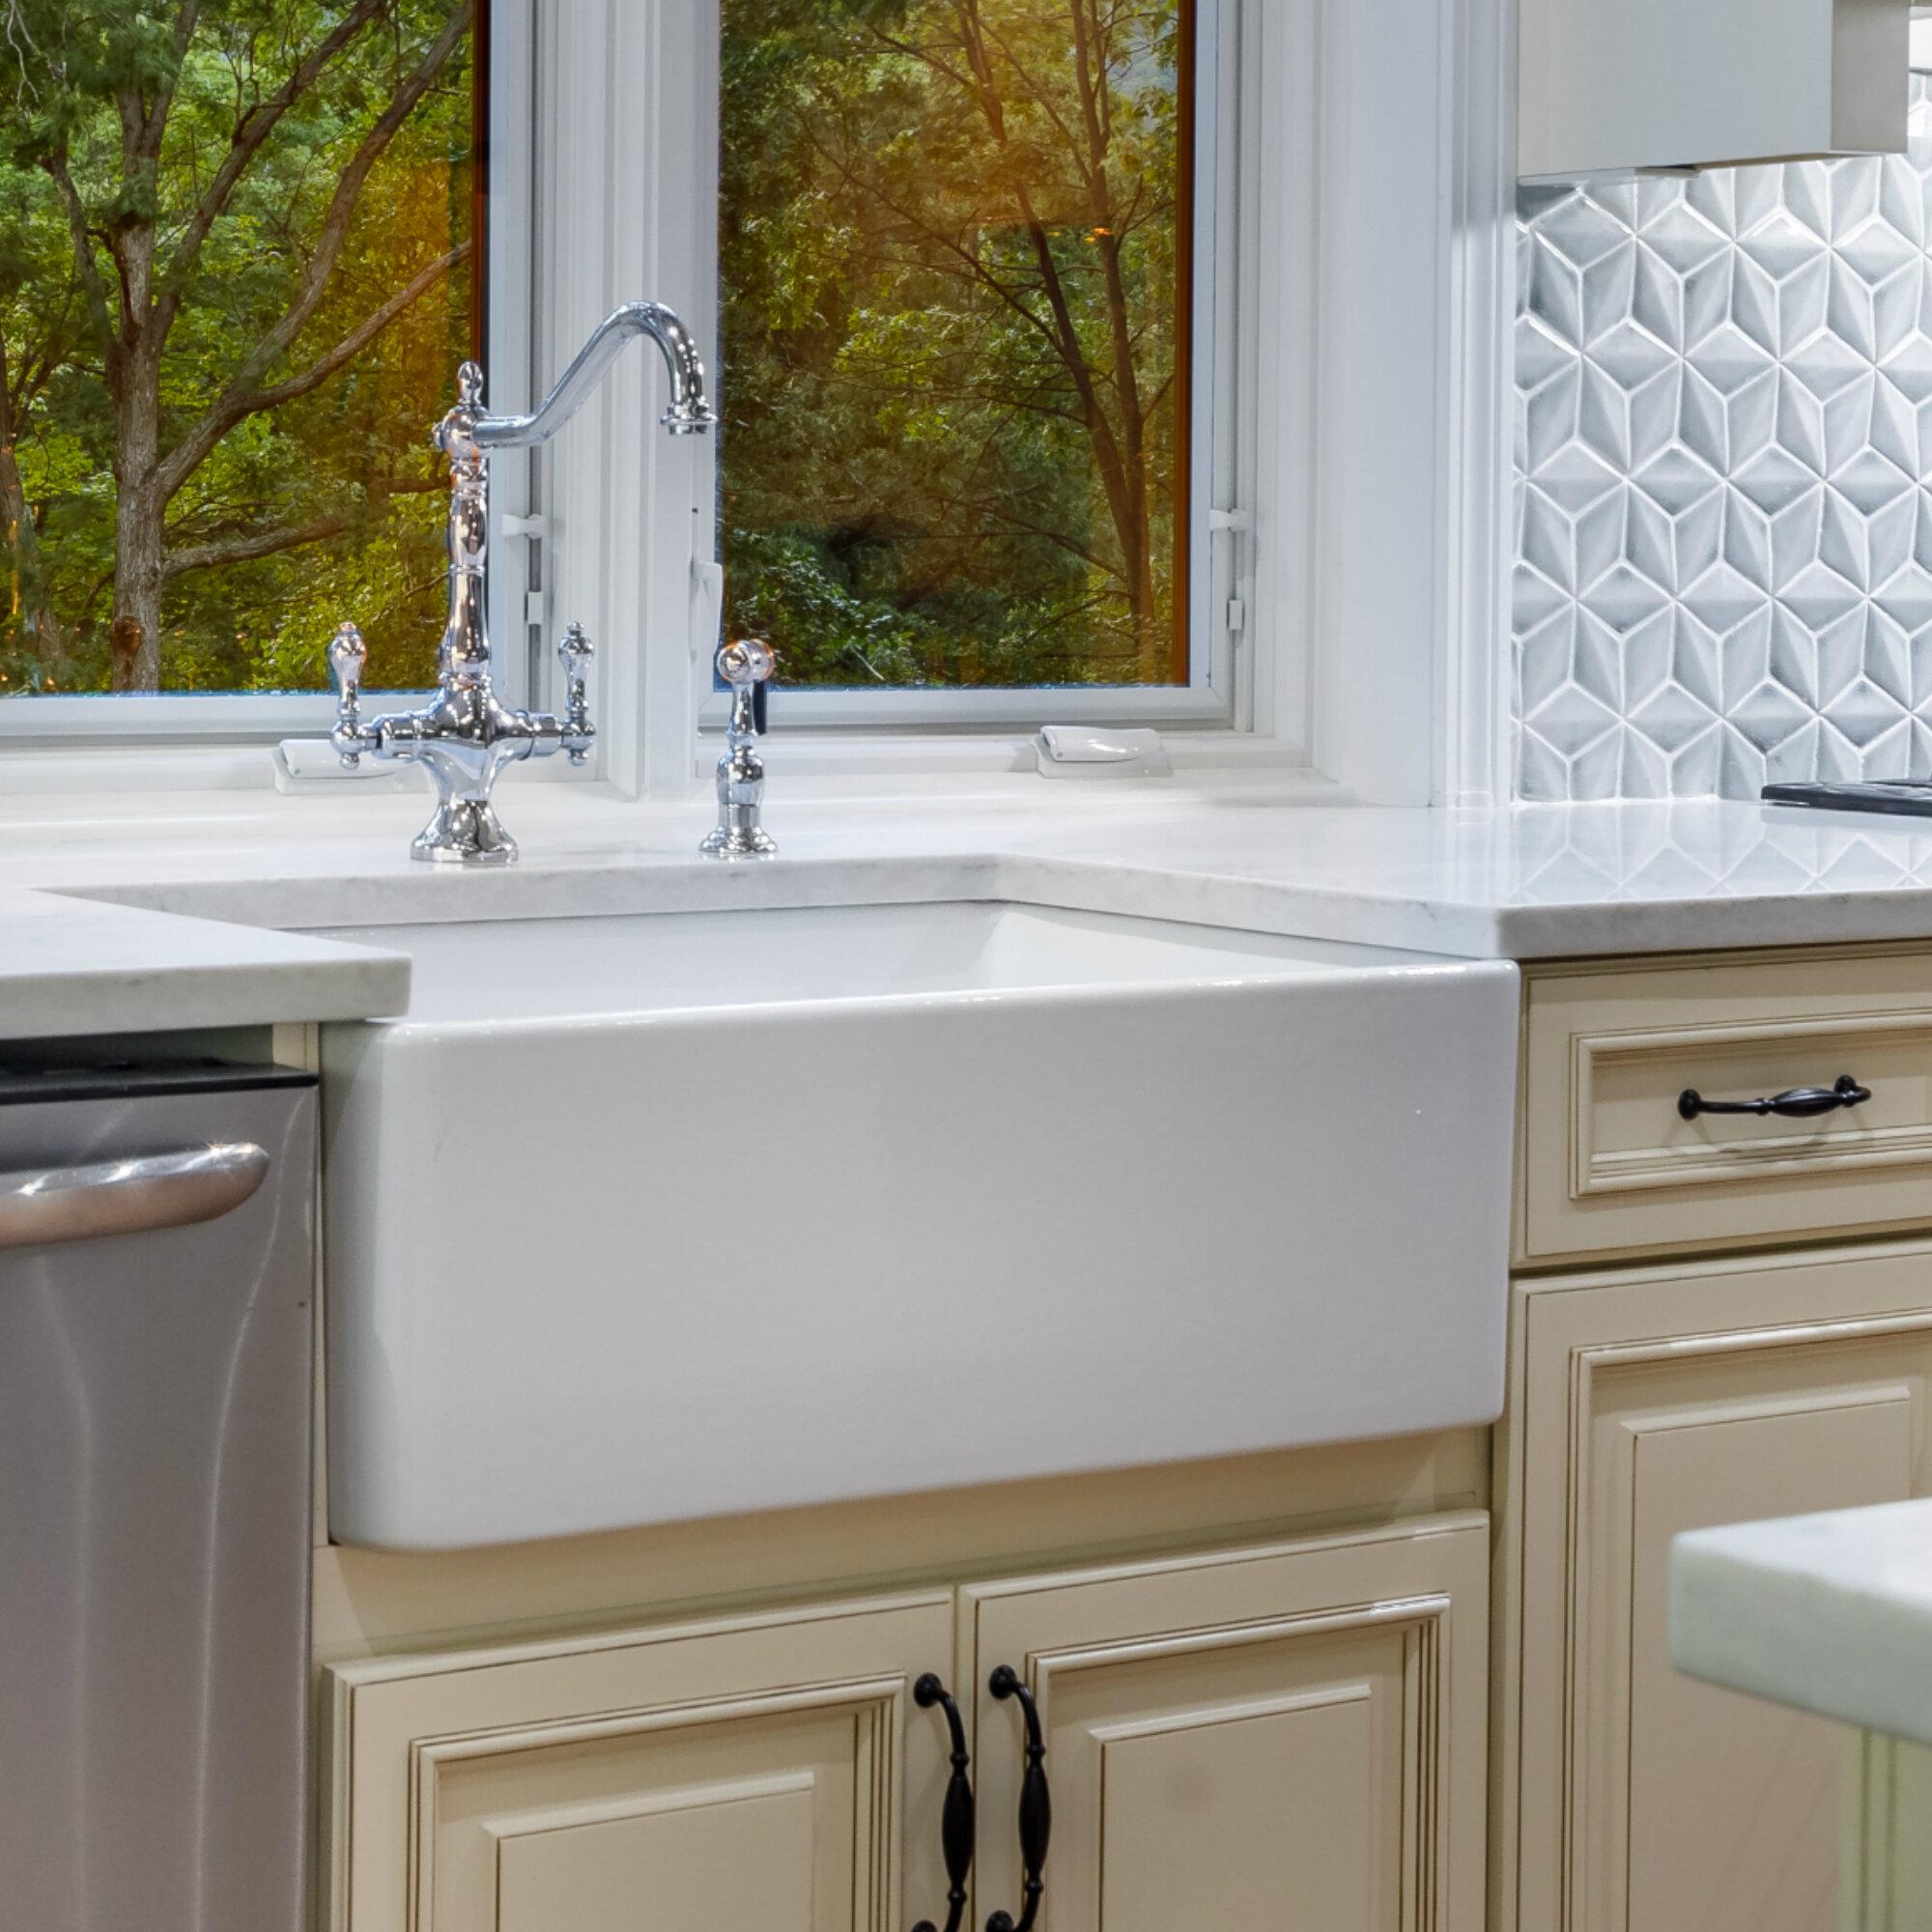 How to Choose a Kitchen Sink | Wayfair